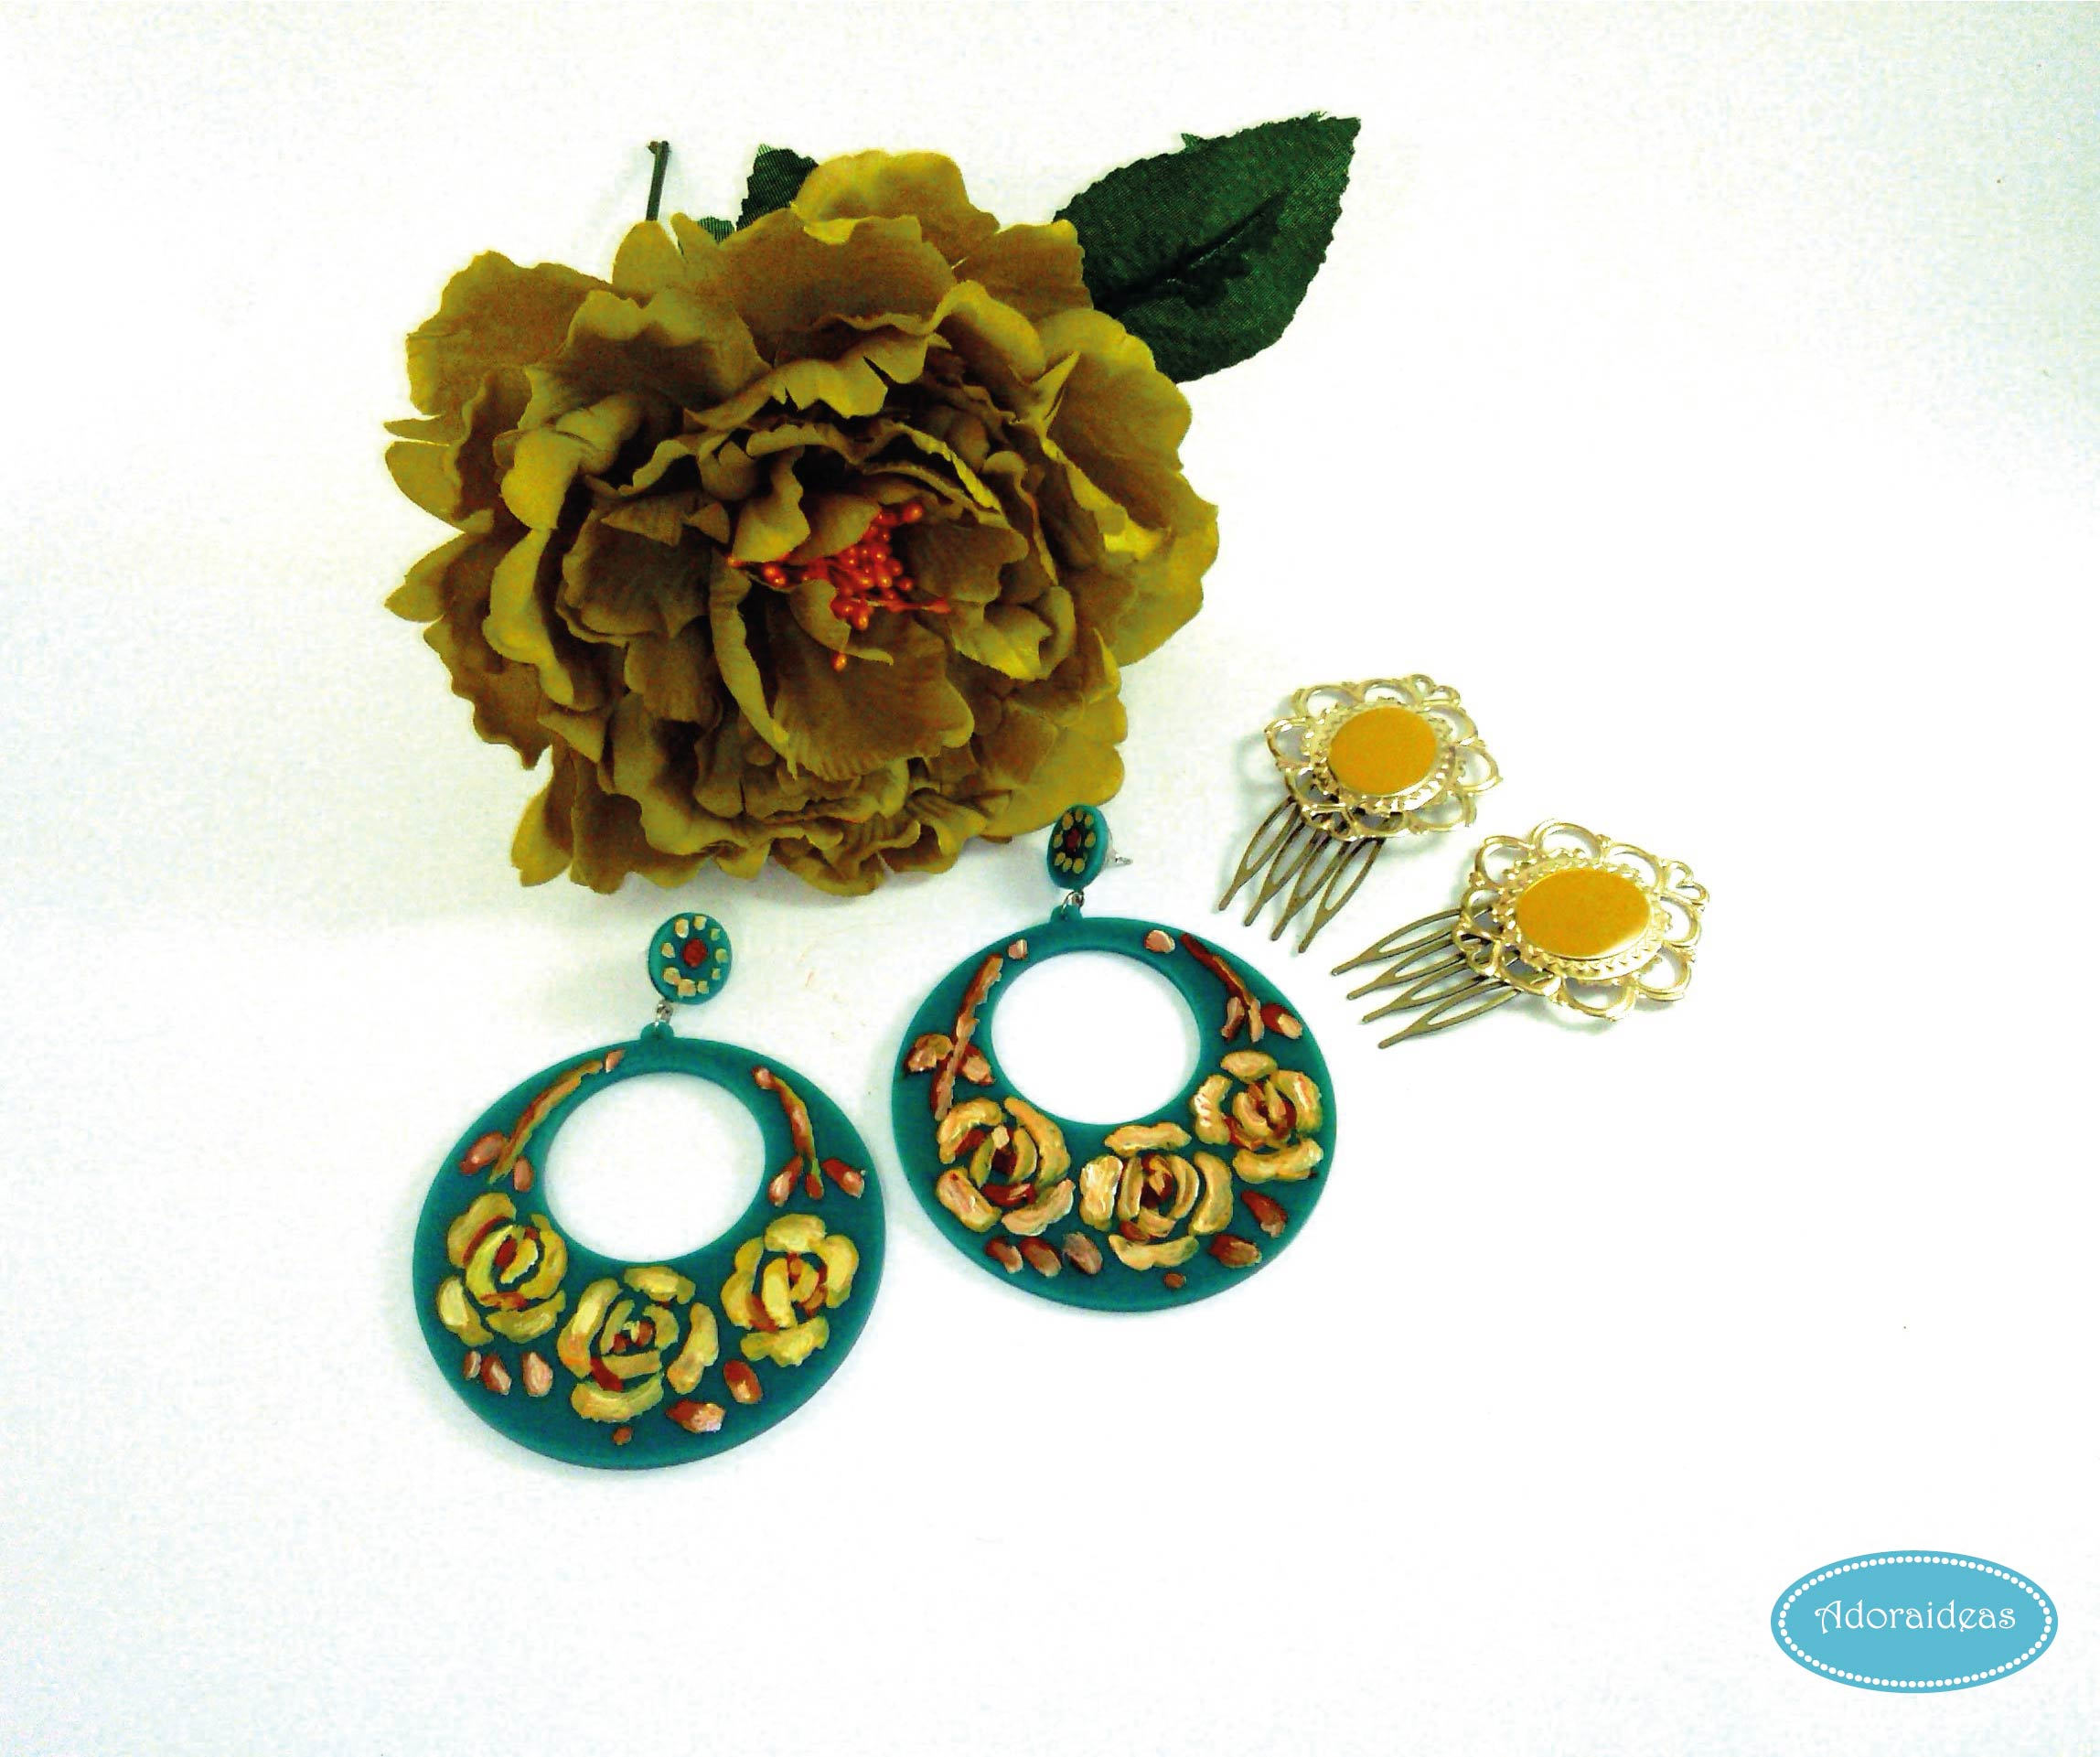 pendientes-pintados-a-mano-peinecillos-feriadeabril-adoraideas-handmade-diy